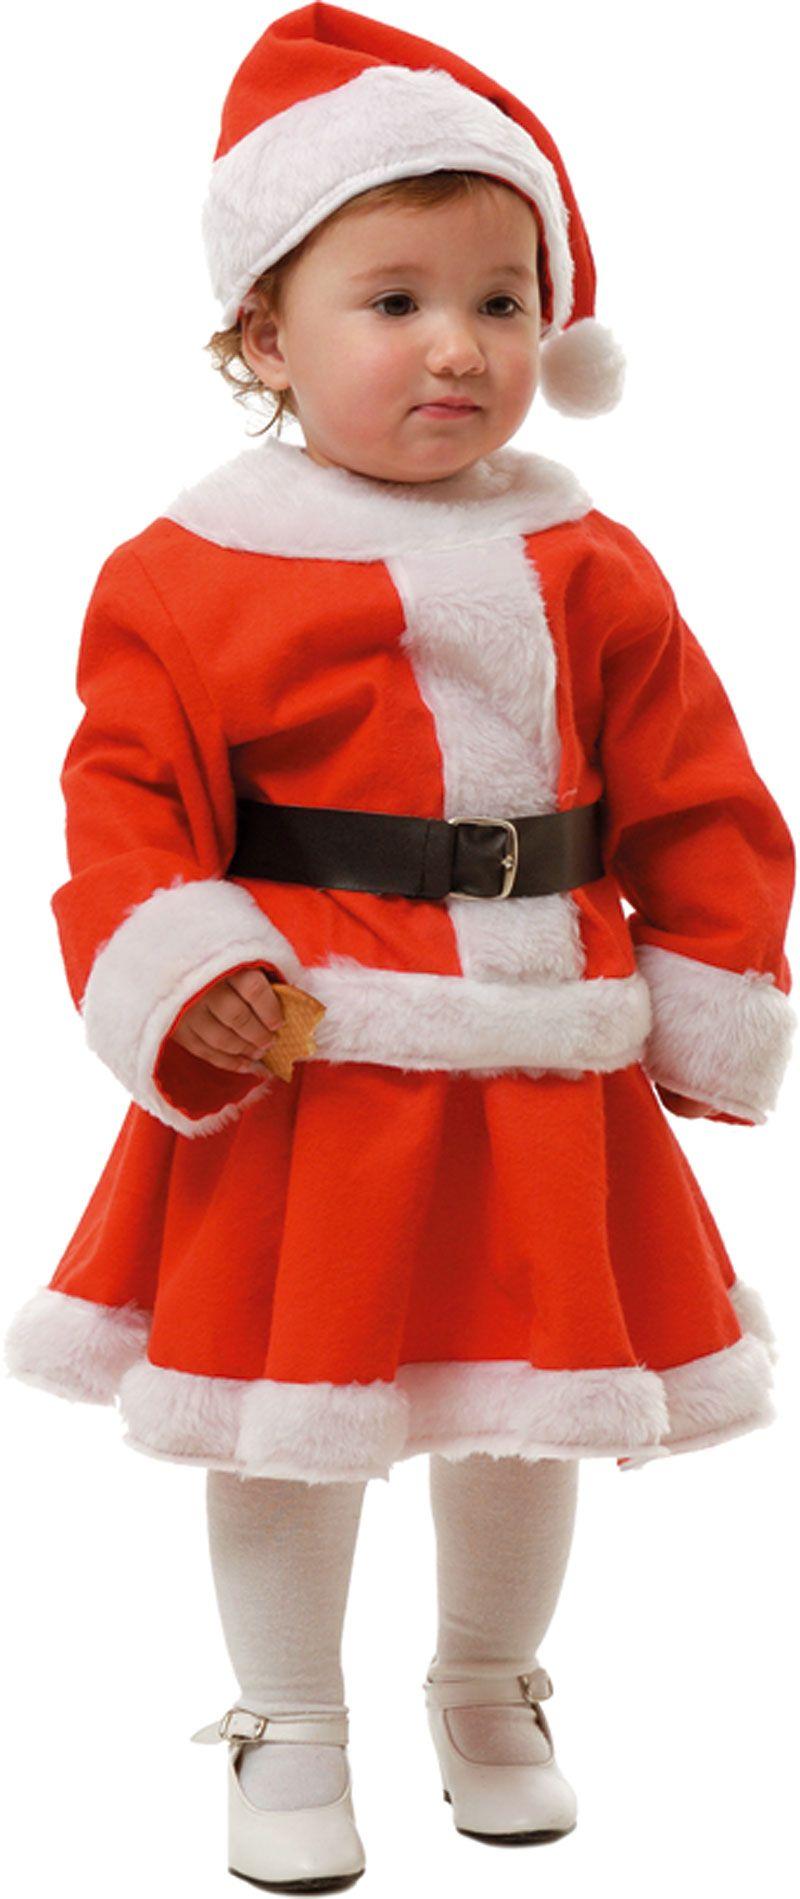 Disfraz mam noel infantil disfraces navidad christmas - Disfraz navideno nina ...